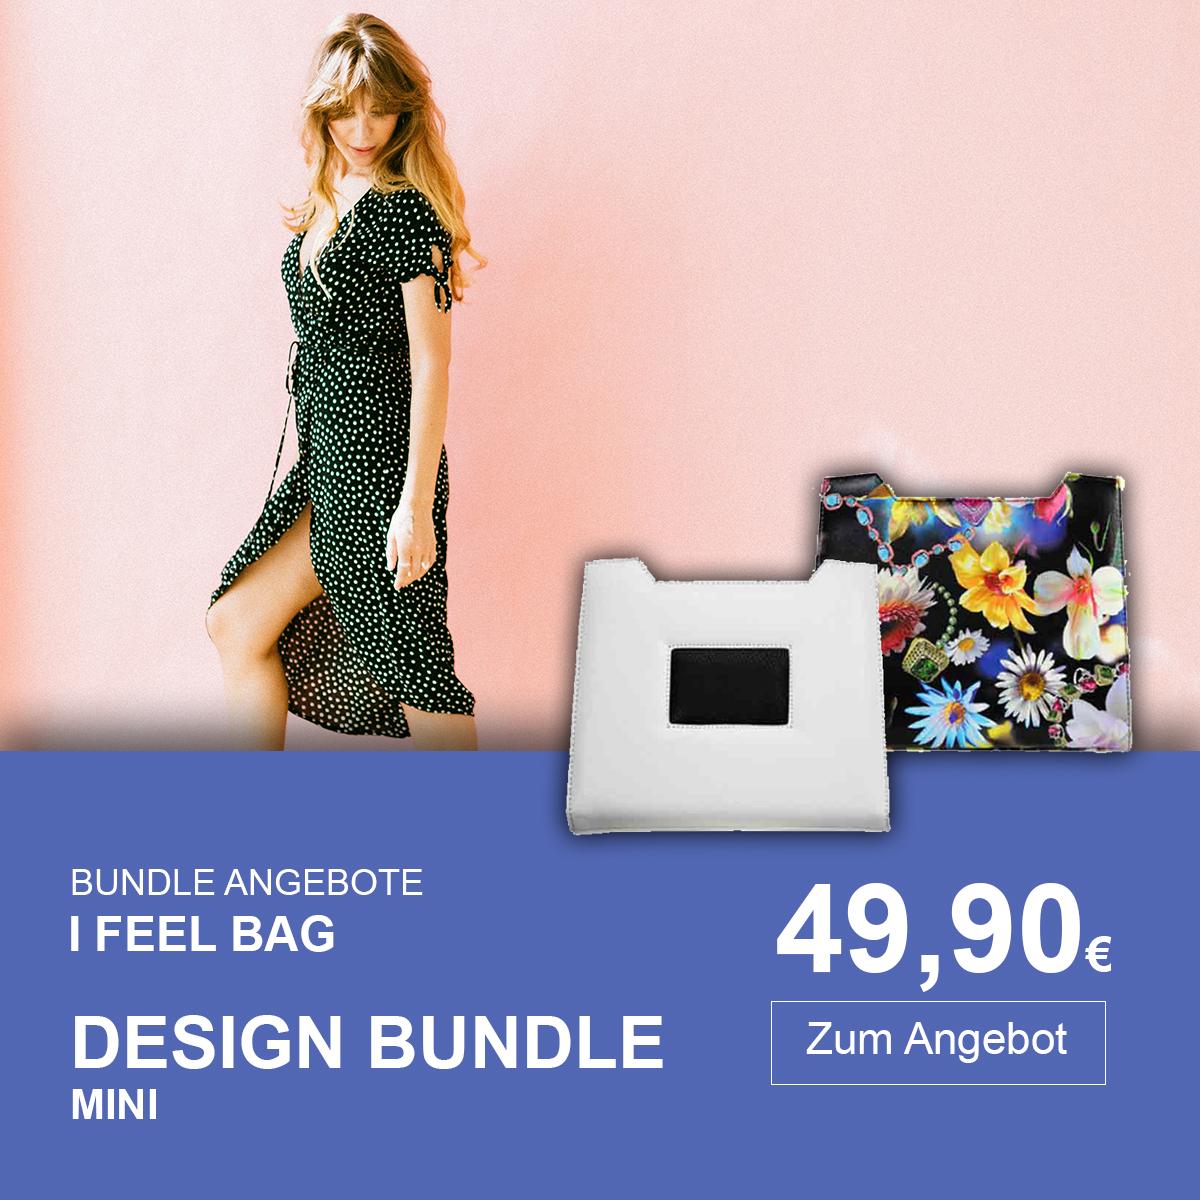 Design Bundle fuer Delieta mini Damenhandtaschen